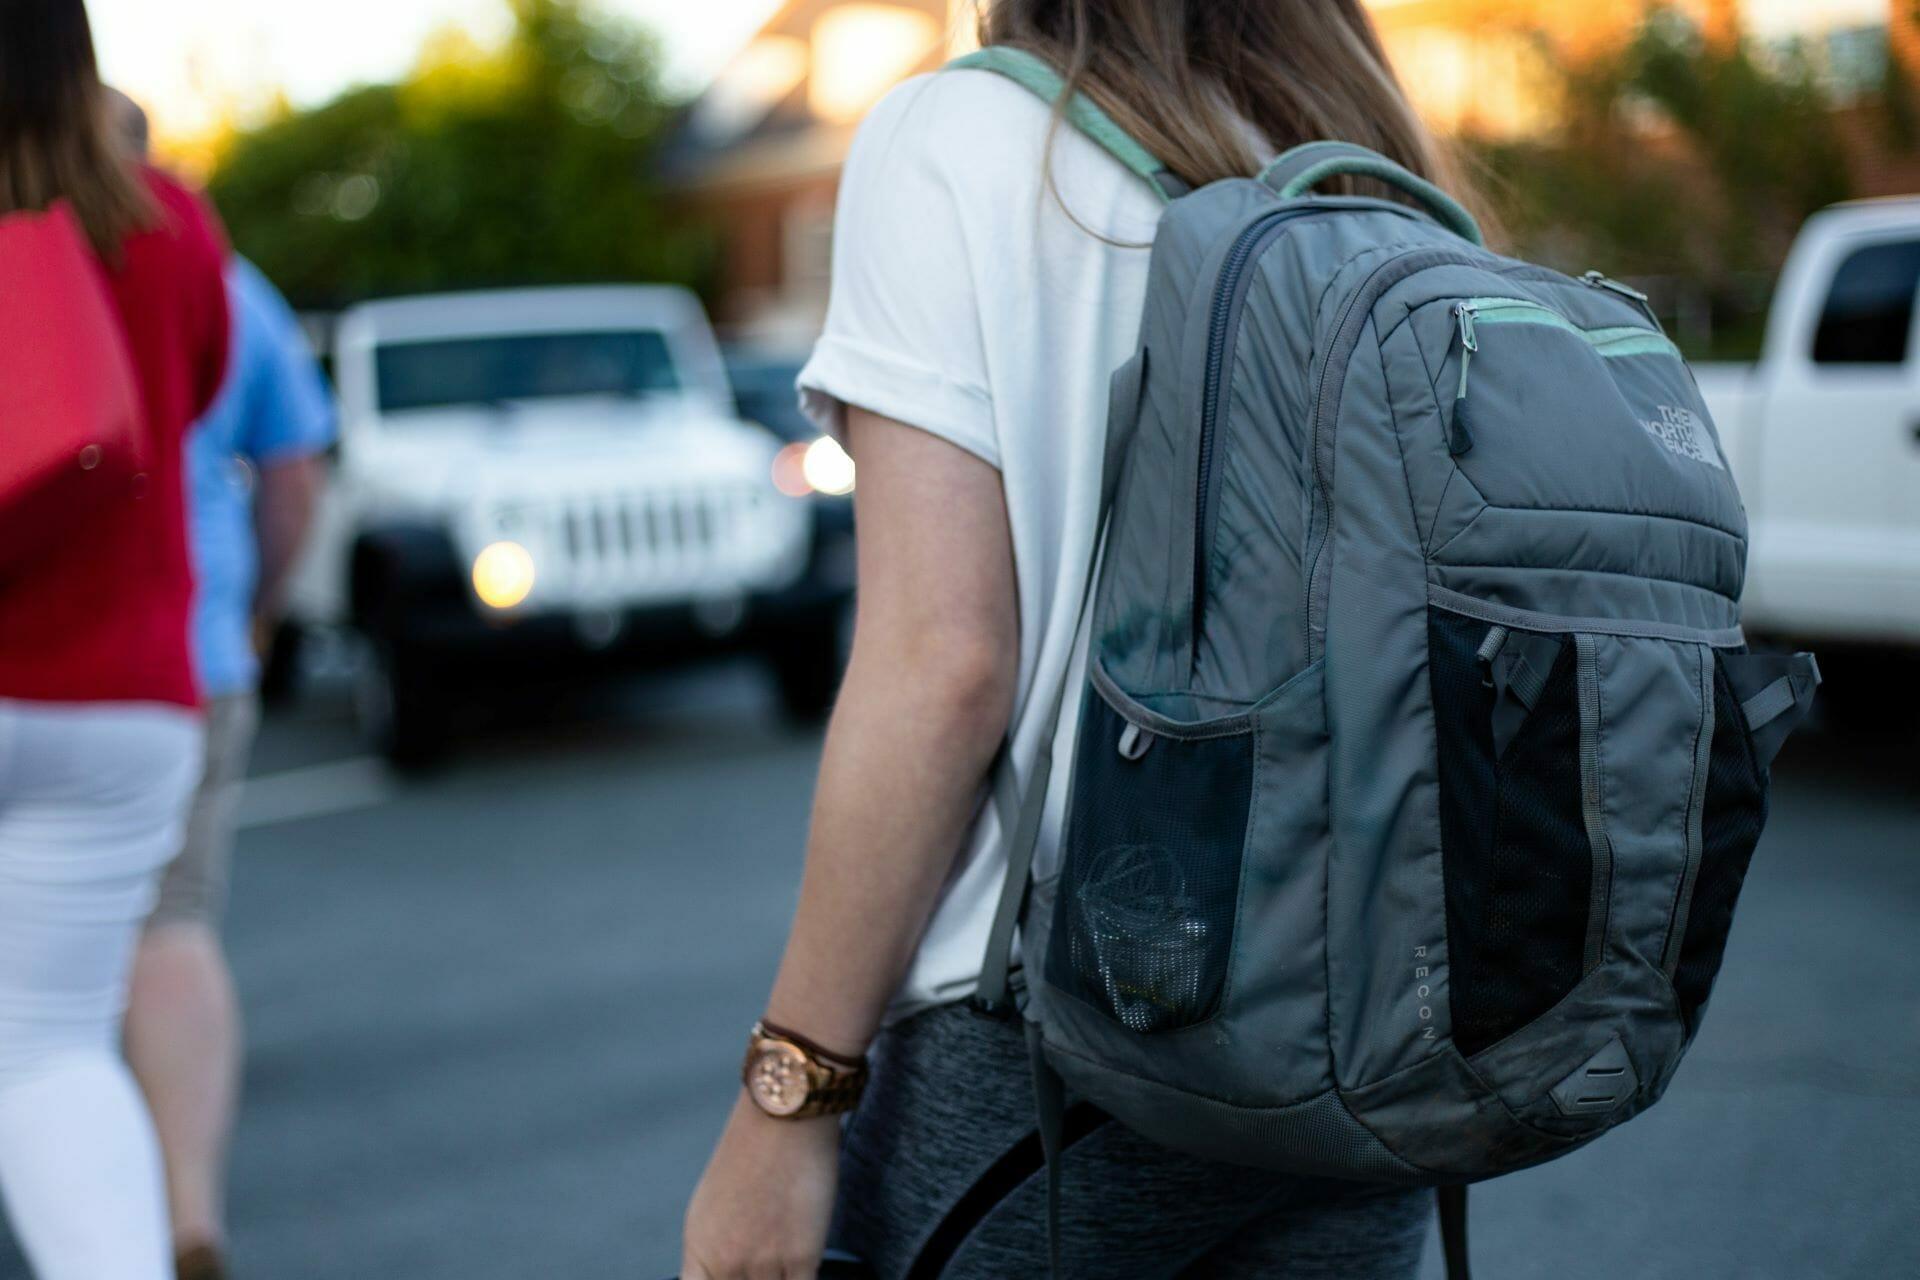 How to Organize Your Backpack: 10 Helpful Hacks via @allamericanatlas